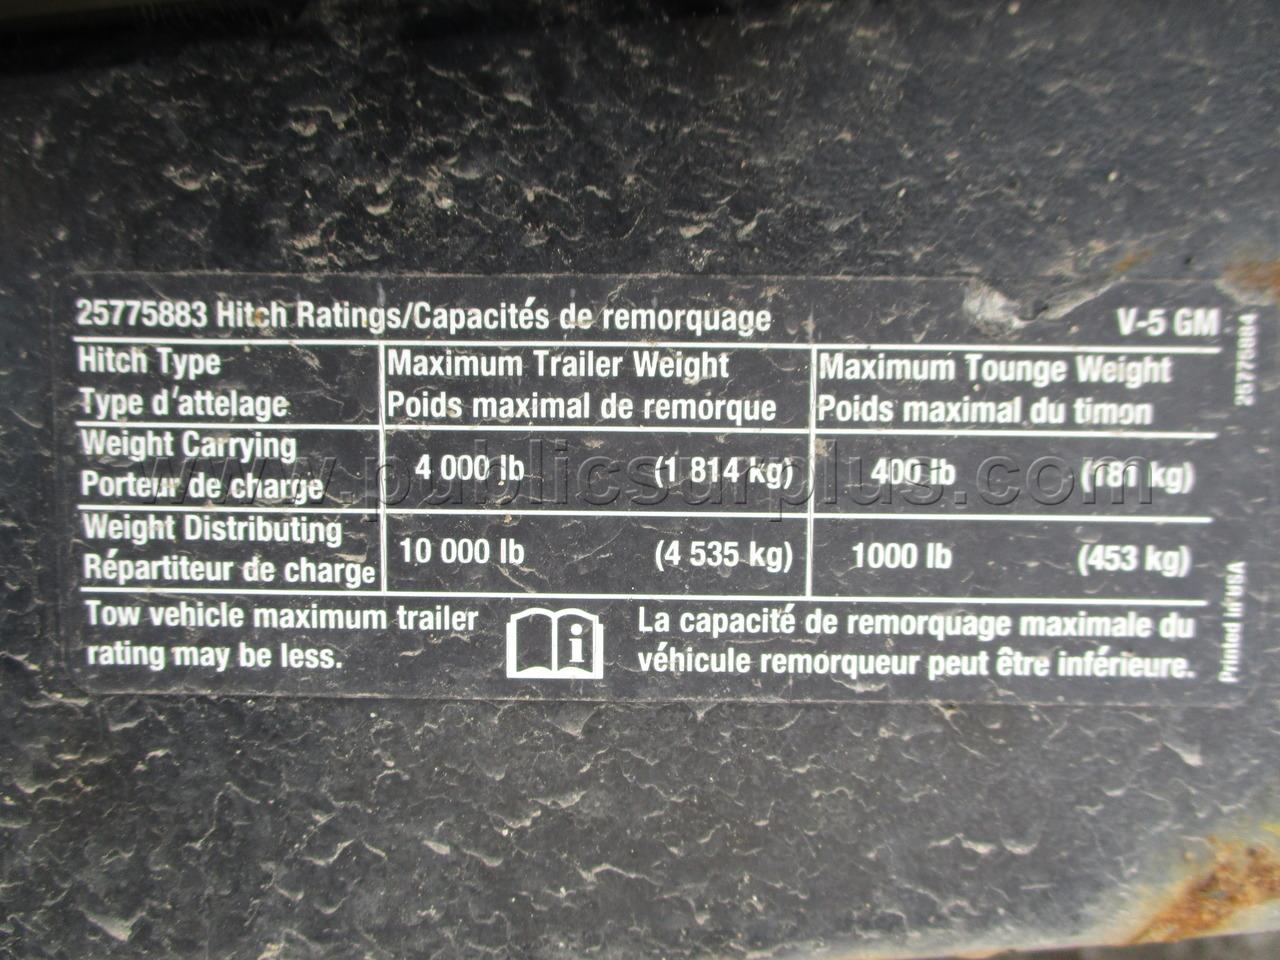 #2104917 - 2013 CHEVROLET EXPRESS PASSENGER VAN - CNG